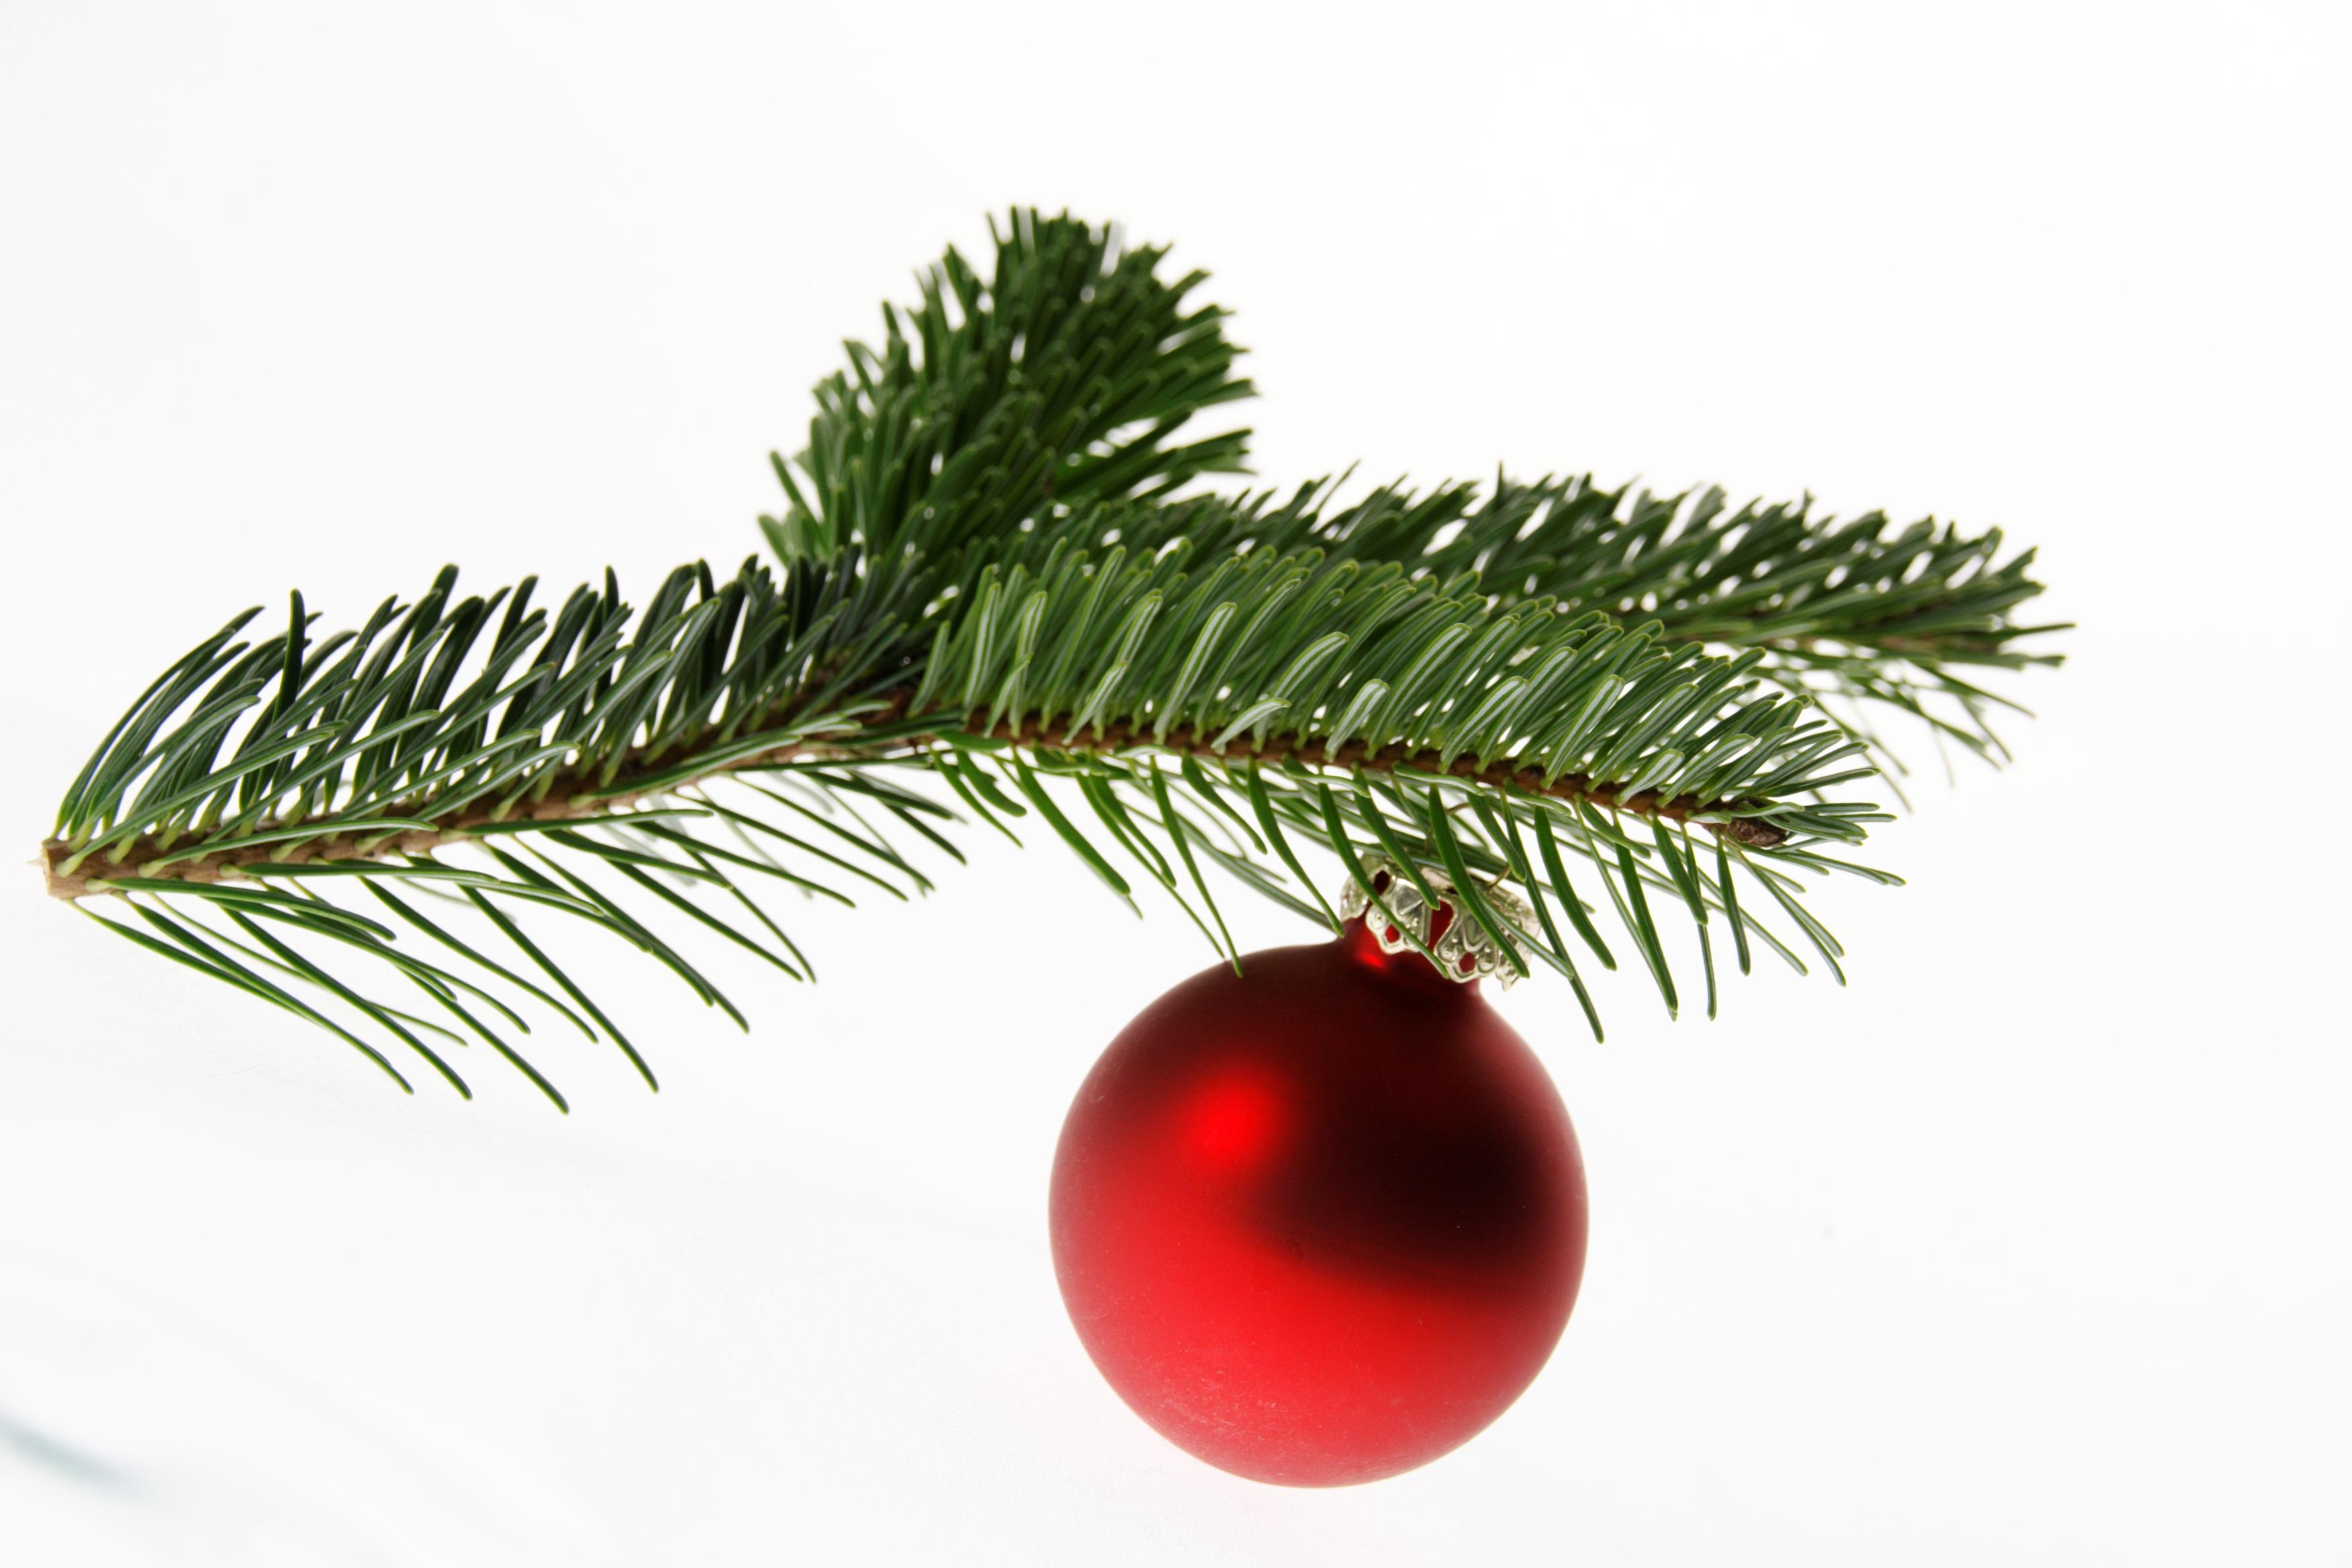 Картинка ветка елки с шарами